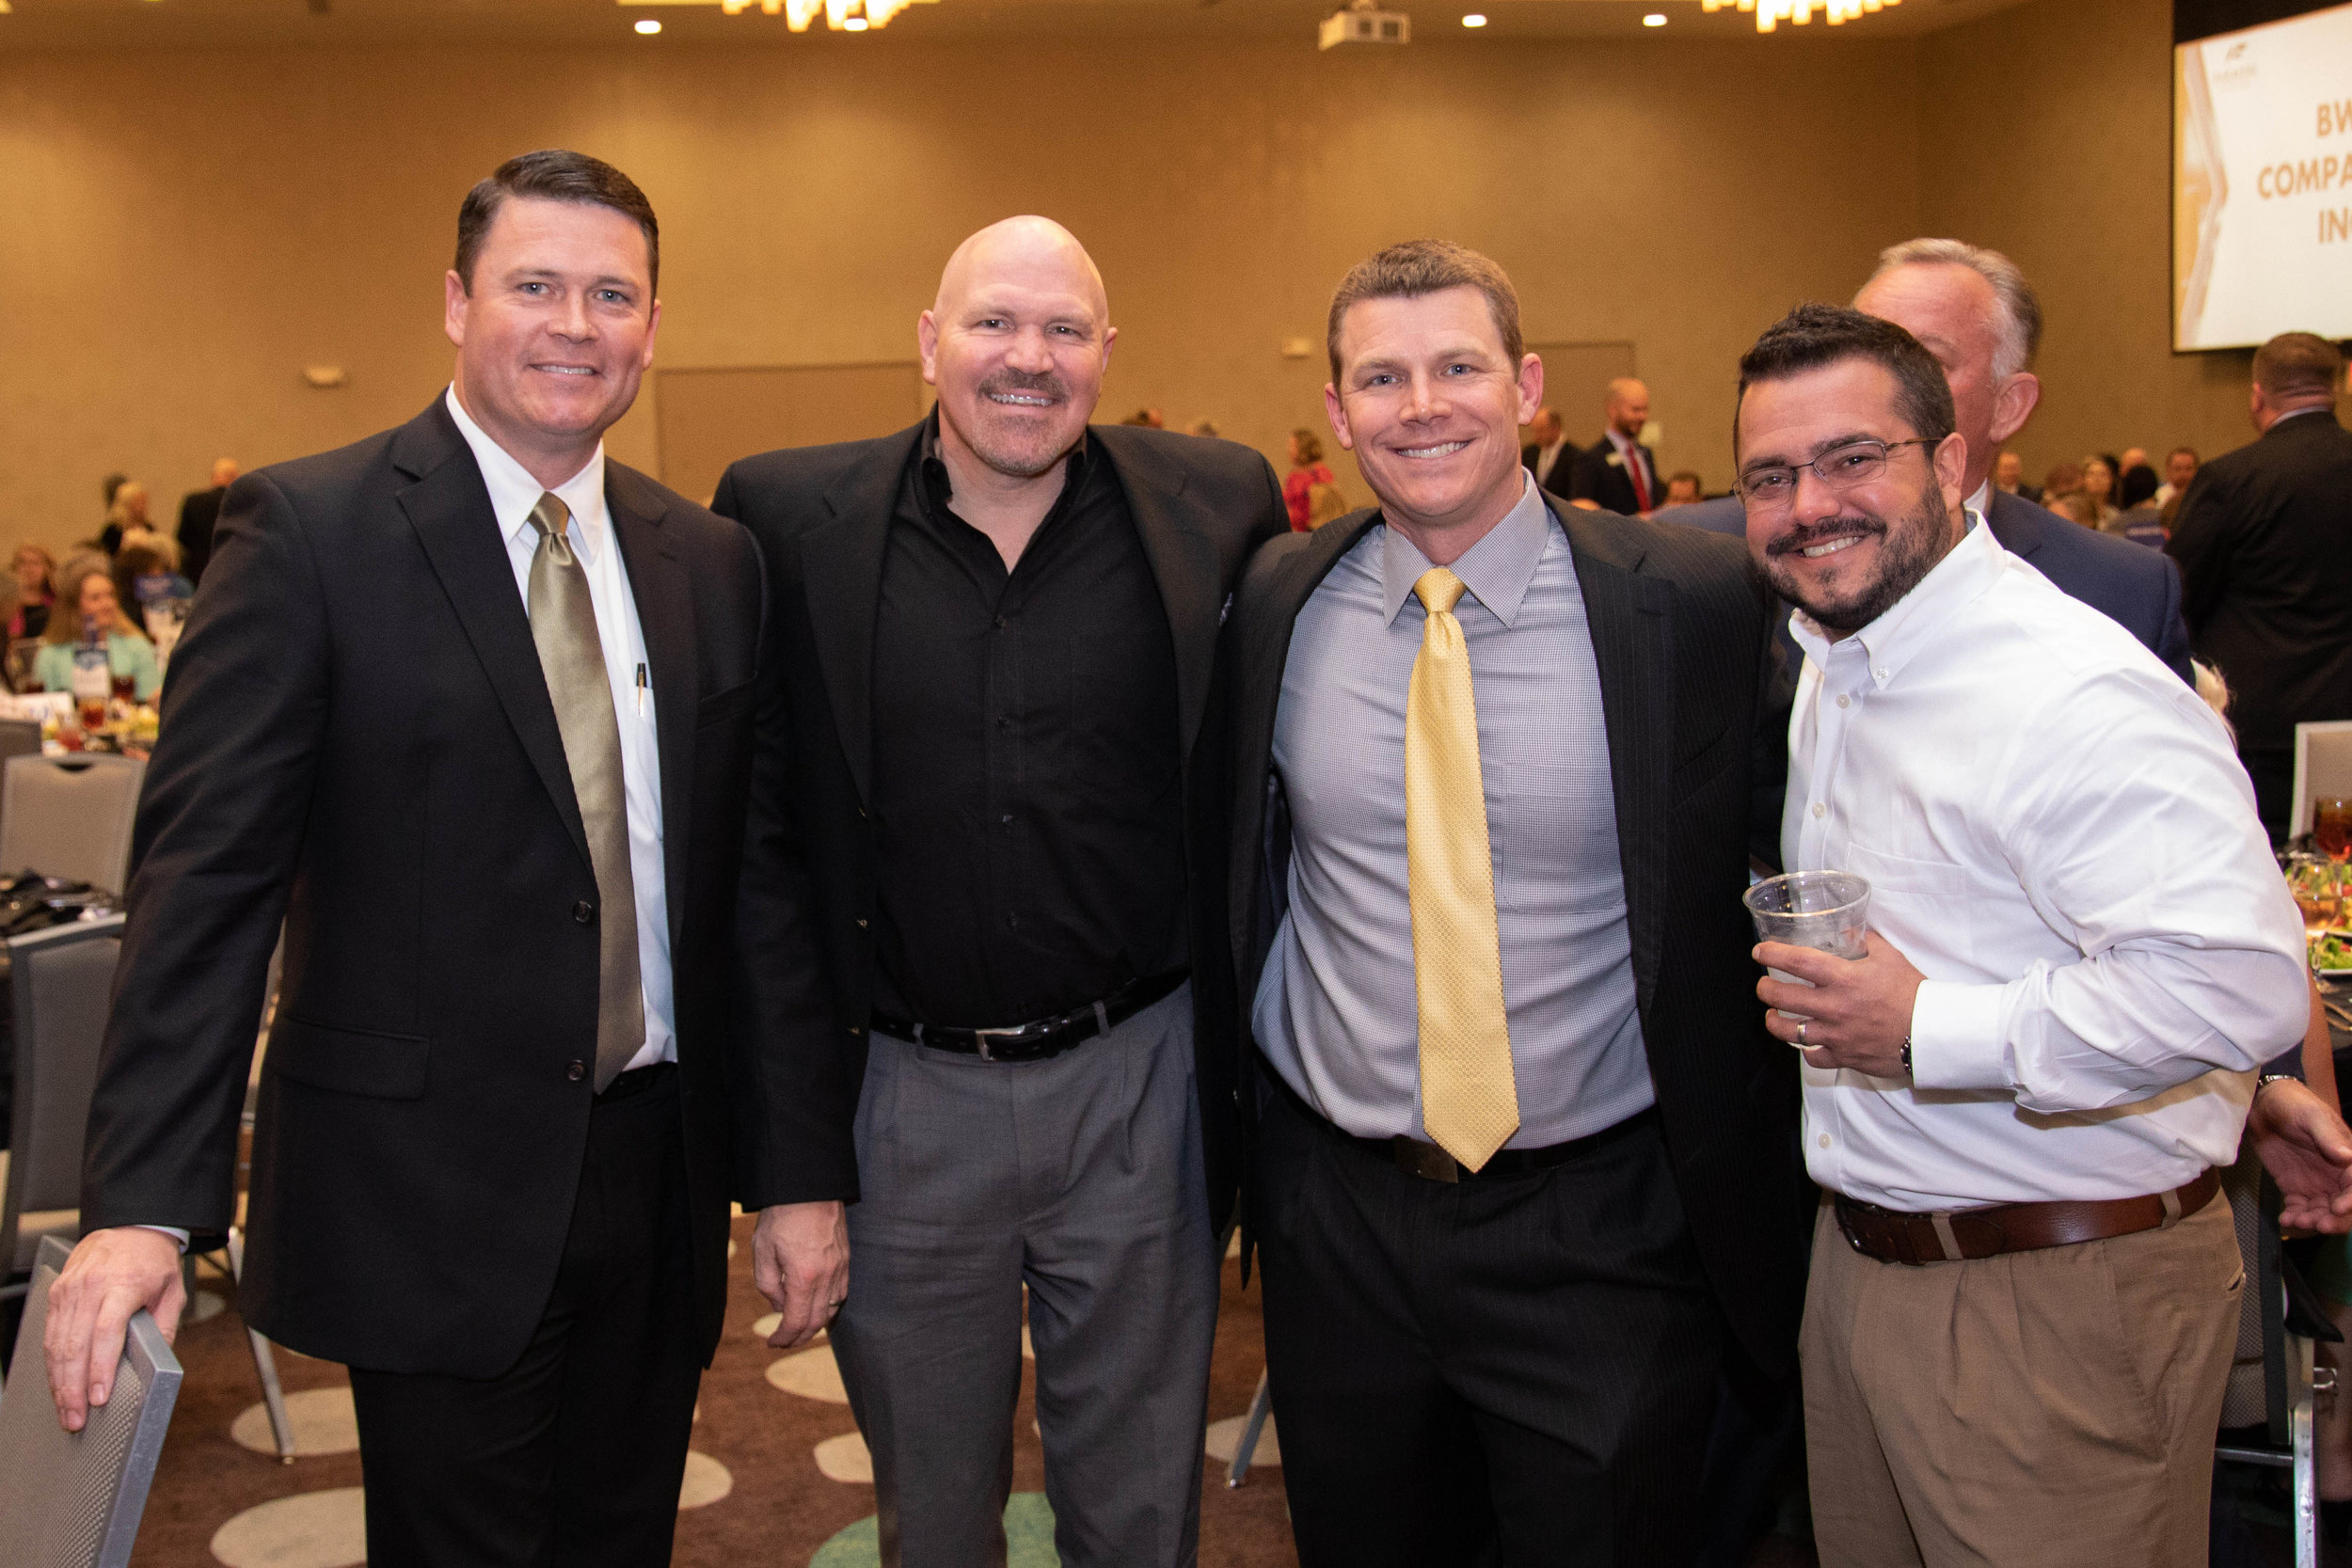 Chad Pirtle, Pastor Jeff Schreve, Josh Gibson and David Ramsey